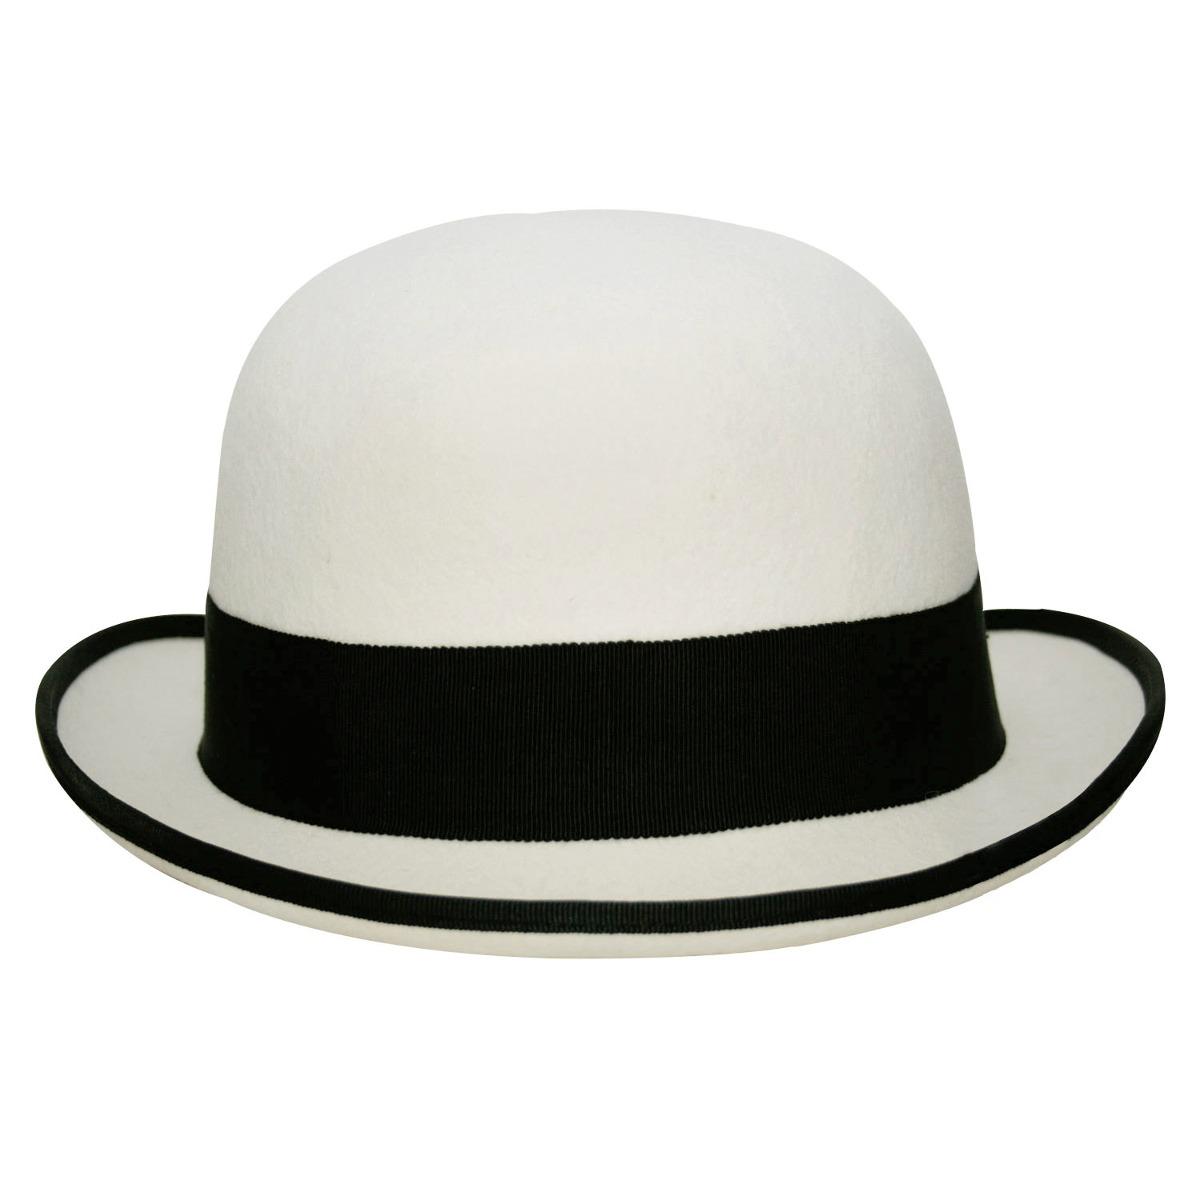 chapéu pralana coco chaplin-branco-tam 54. Carregando zoom. d15de89033d